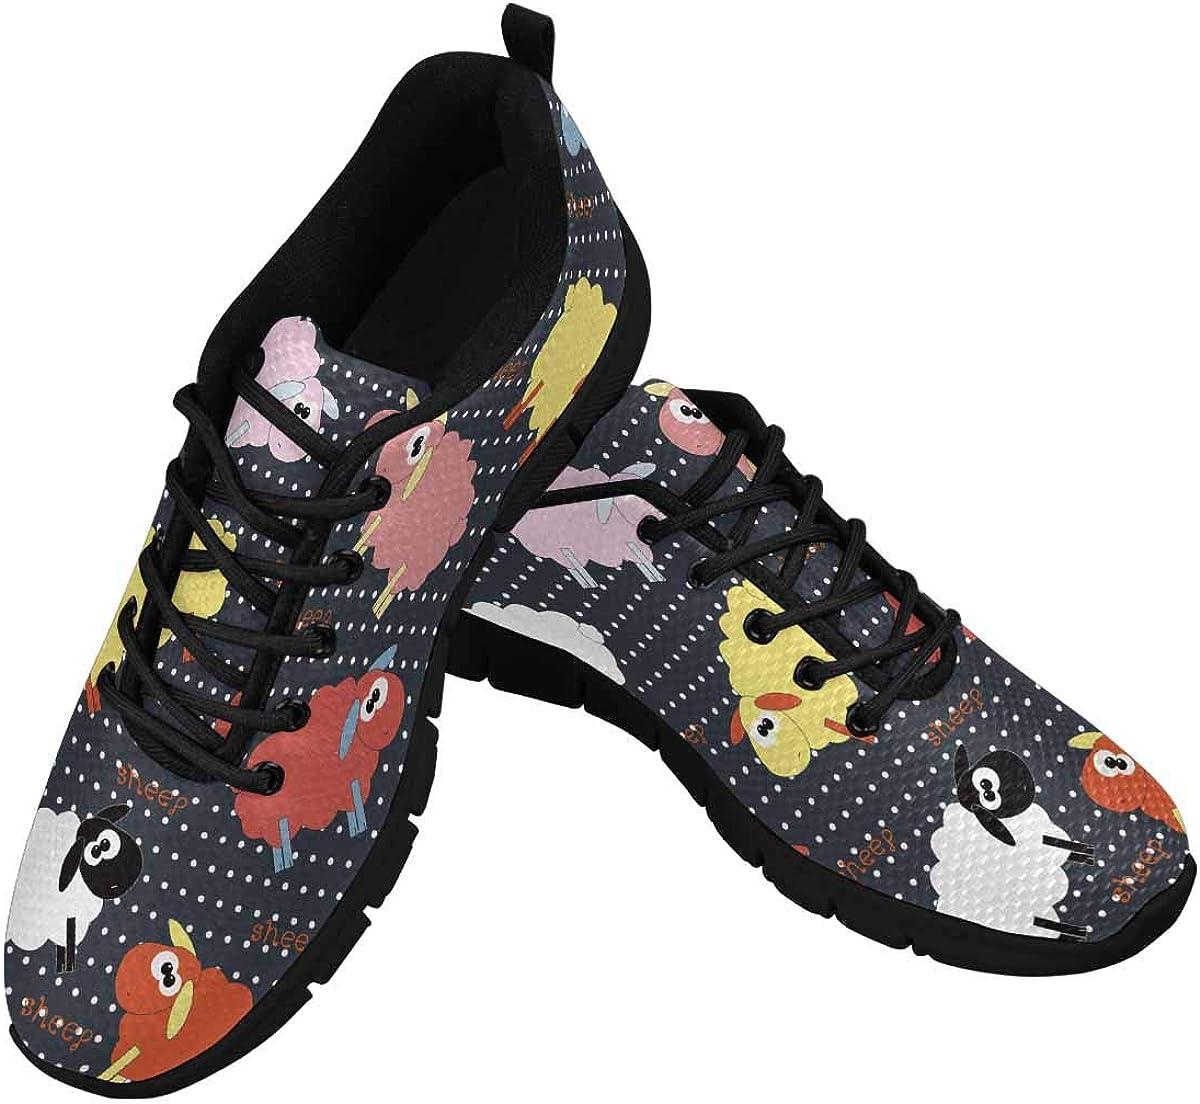 INTERESTPRINT Cute Sheep Pattern Women's Athletic Walking Shoes Breathe Comfort Mesh